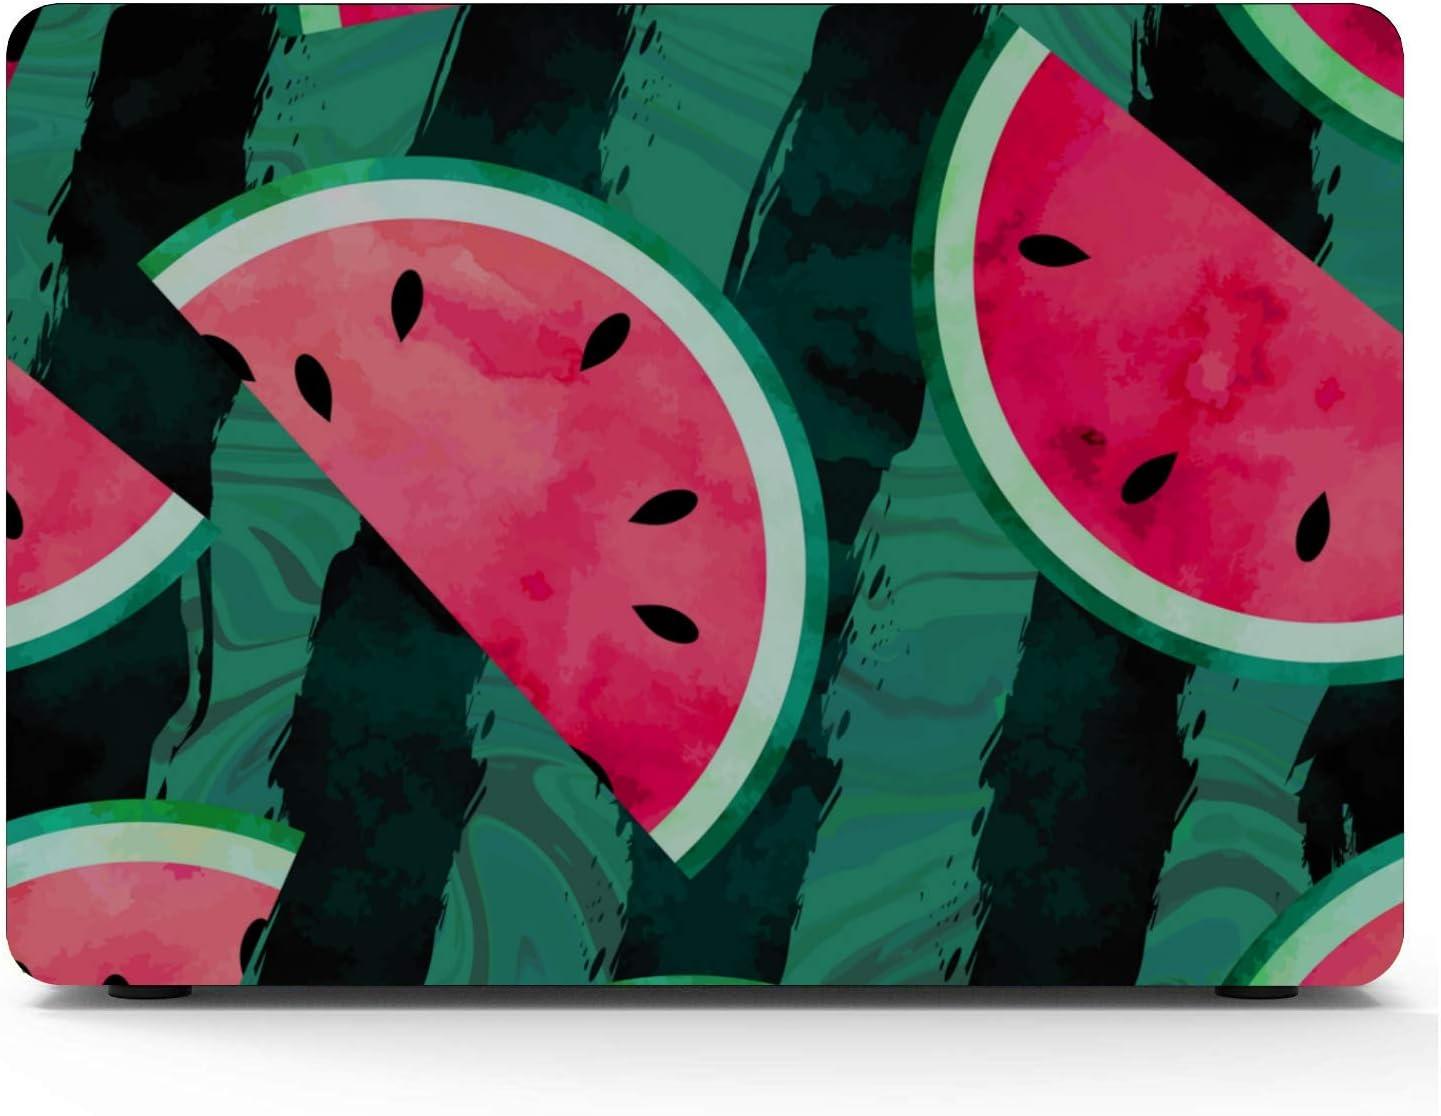 Laptop Case Summer Vintage Cute Fruit Watermelon Plastic Hard Shell Compatible Mac Air 11 Pro 13 15 12 Inch MacBook Case Protection for MacBook 2016-2019 Version